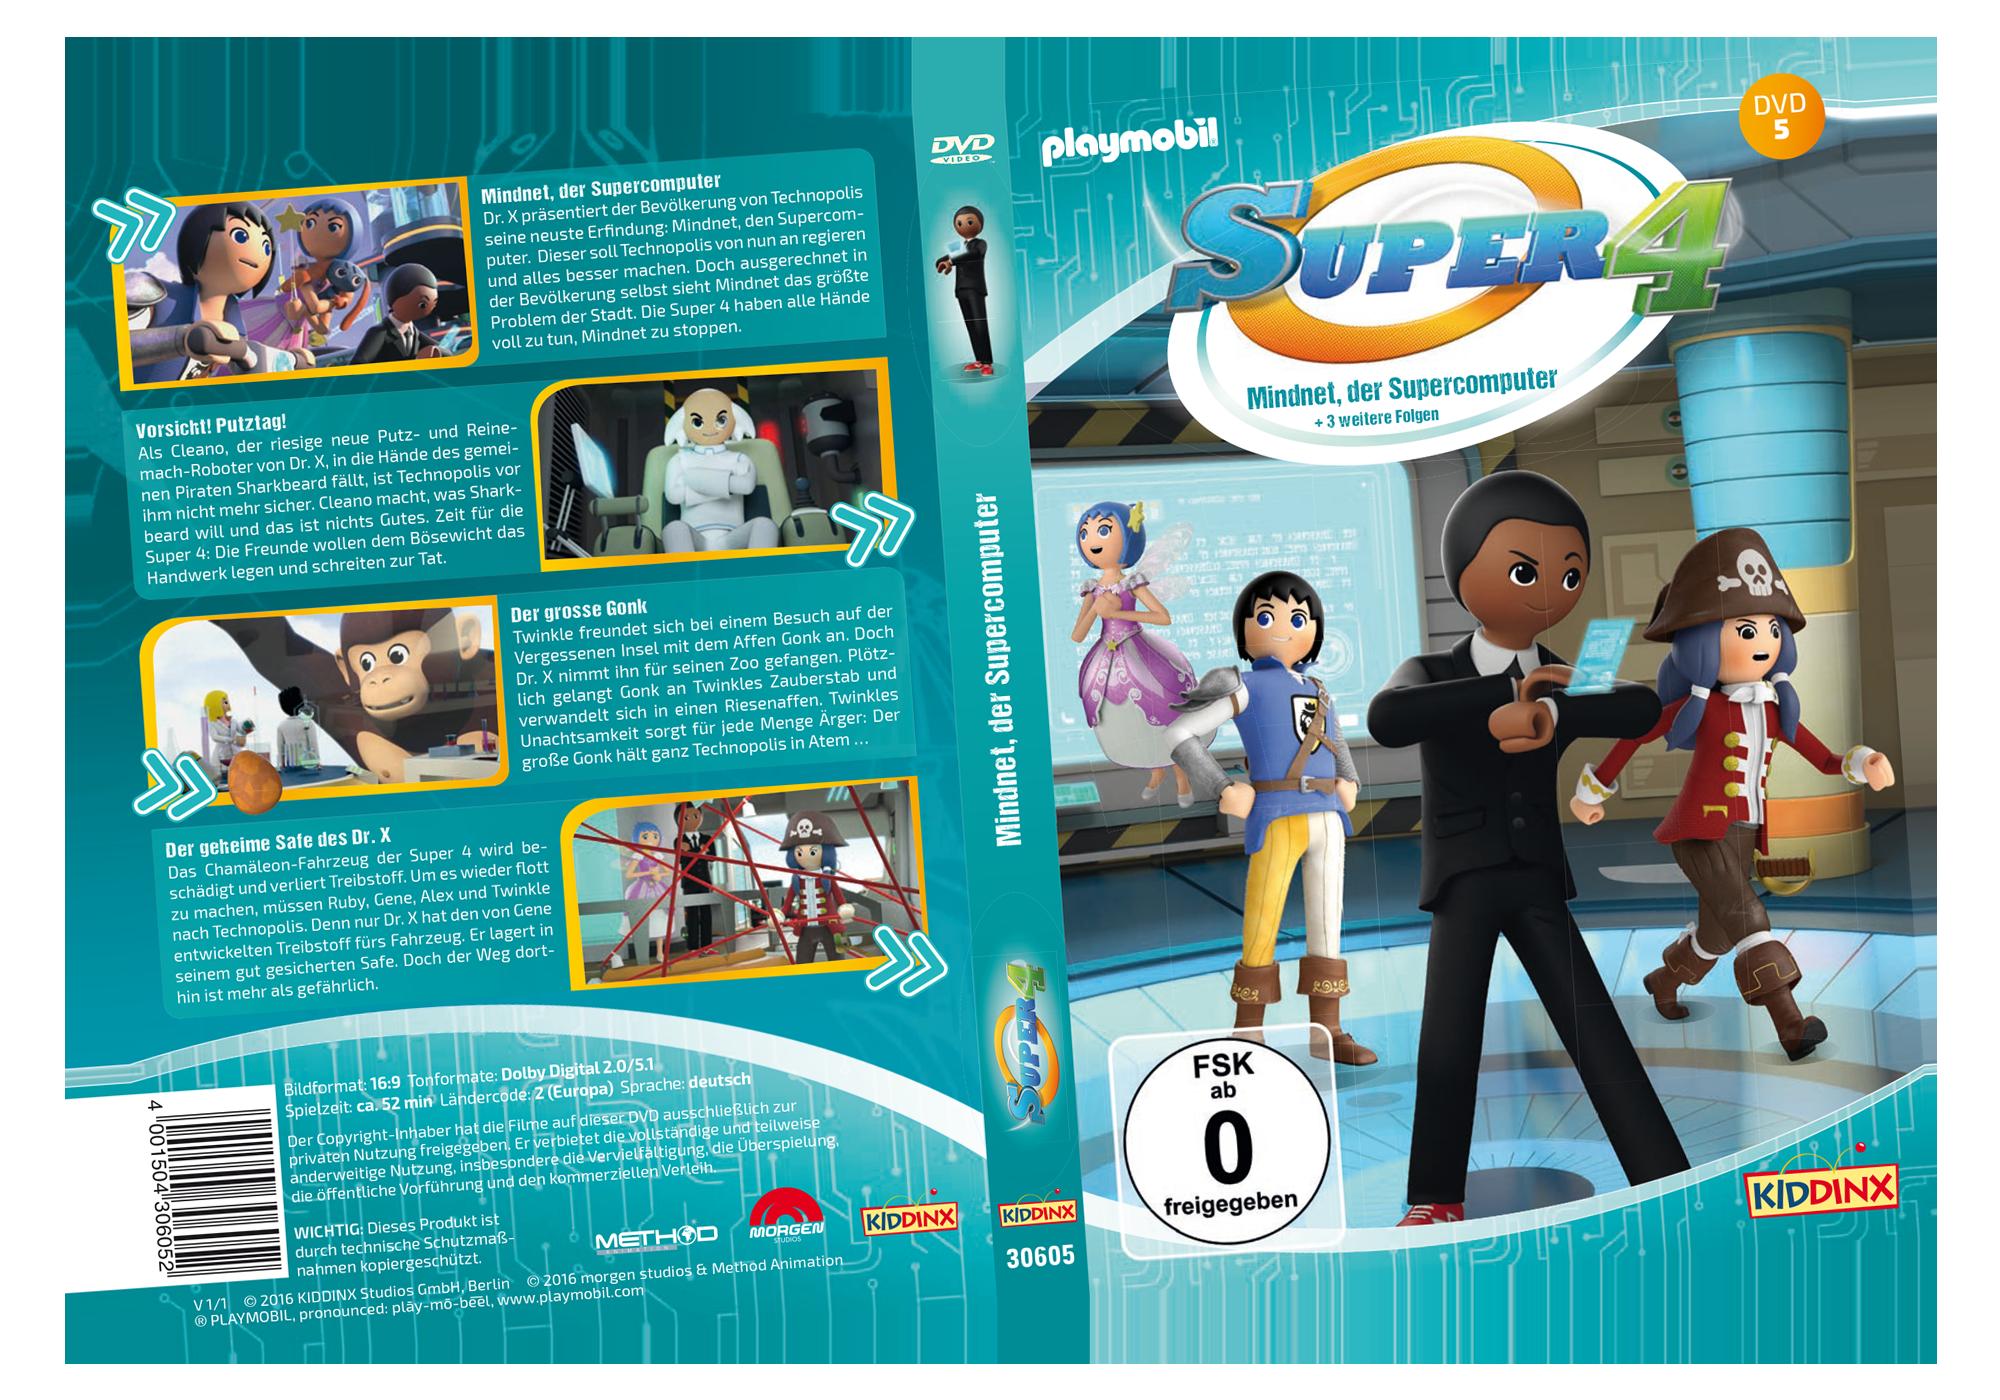 http://media.playmobil.com/i/playmobil/80480_product_detail/DVD 5 Super4: Mindnet,der Supercomputer